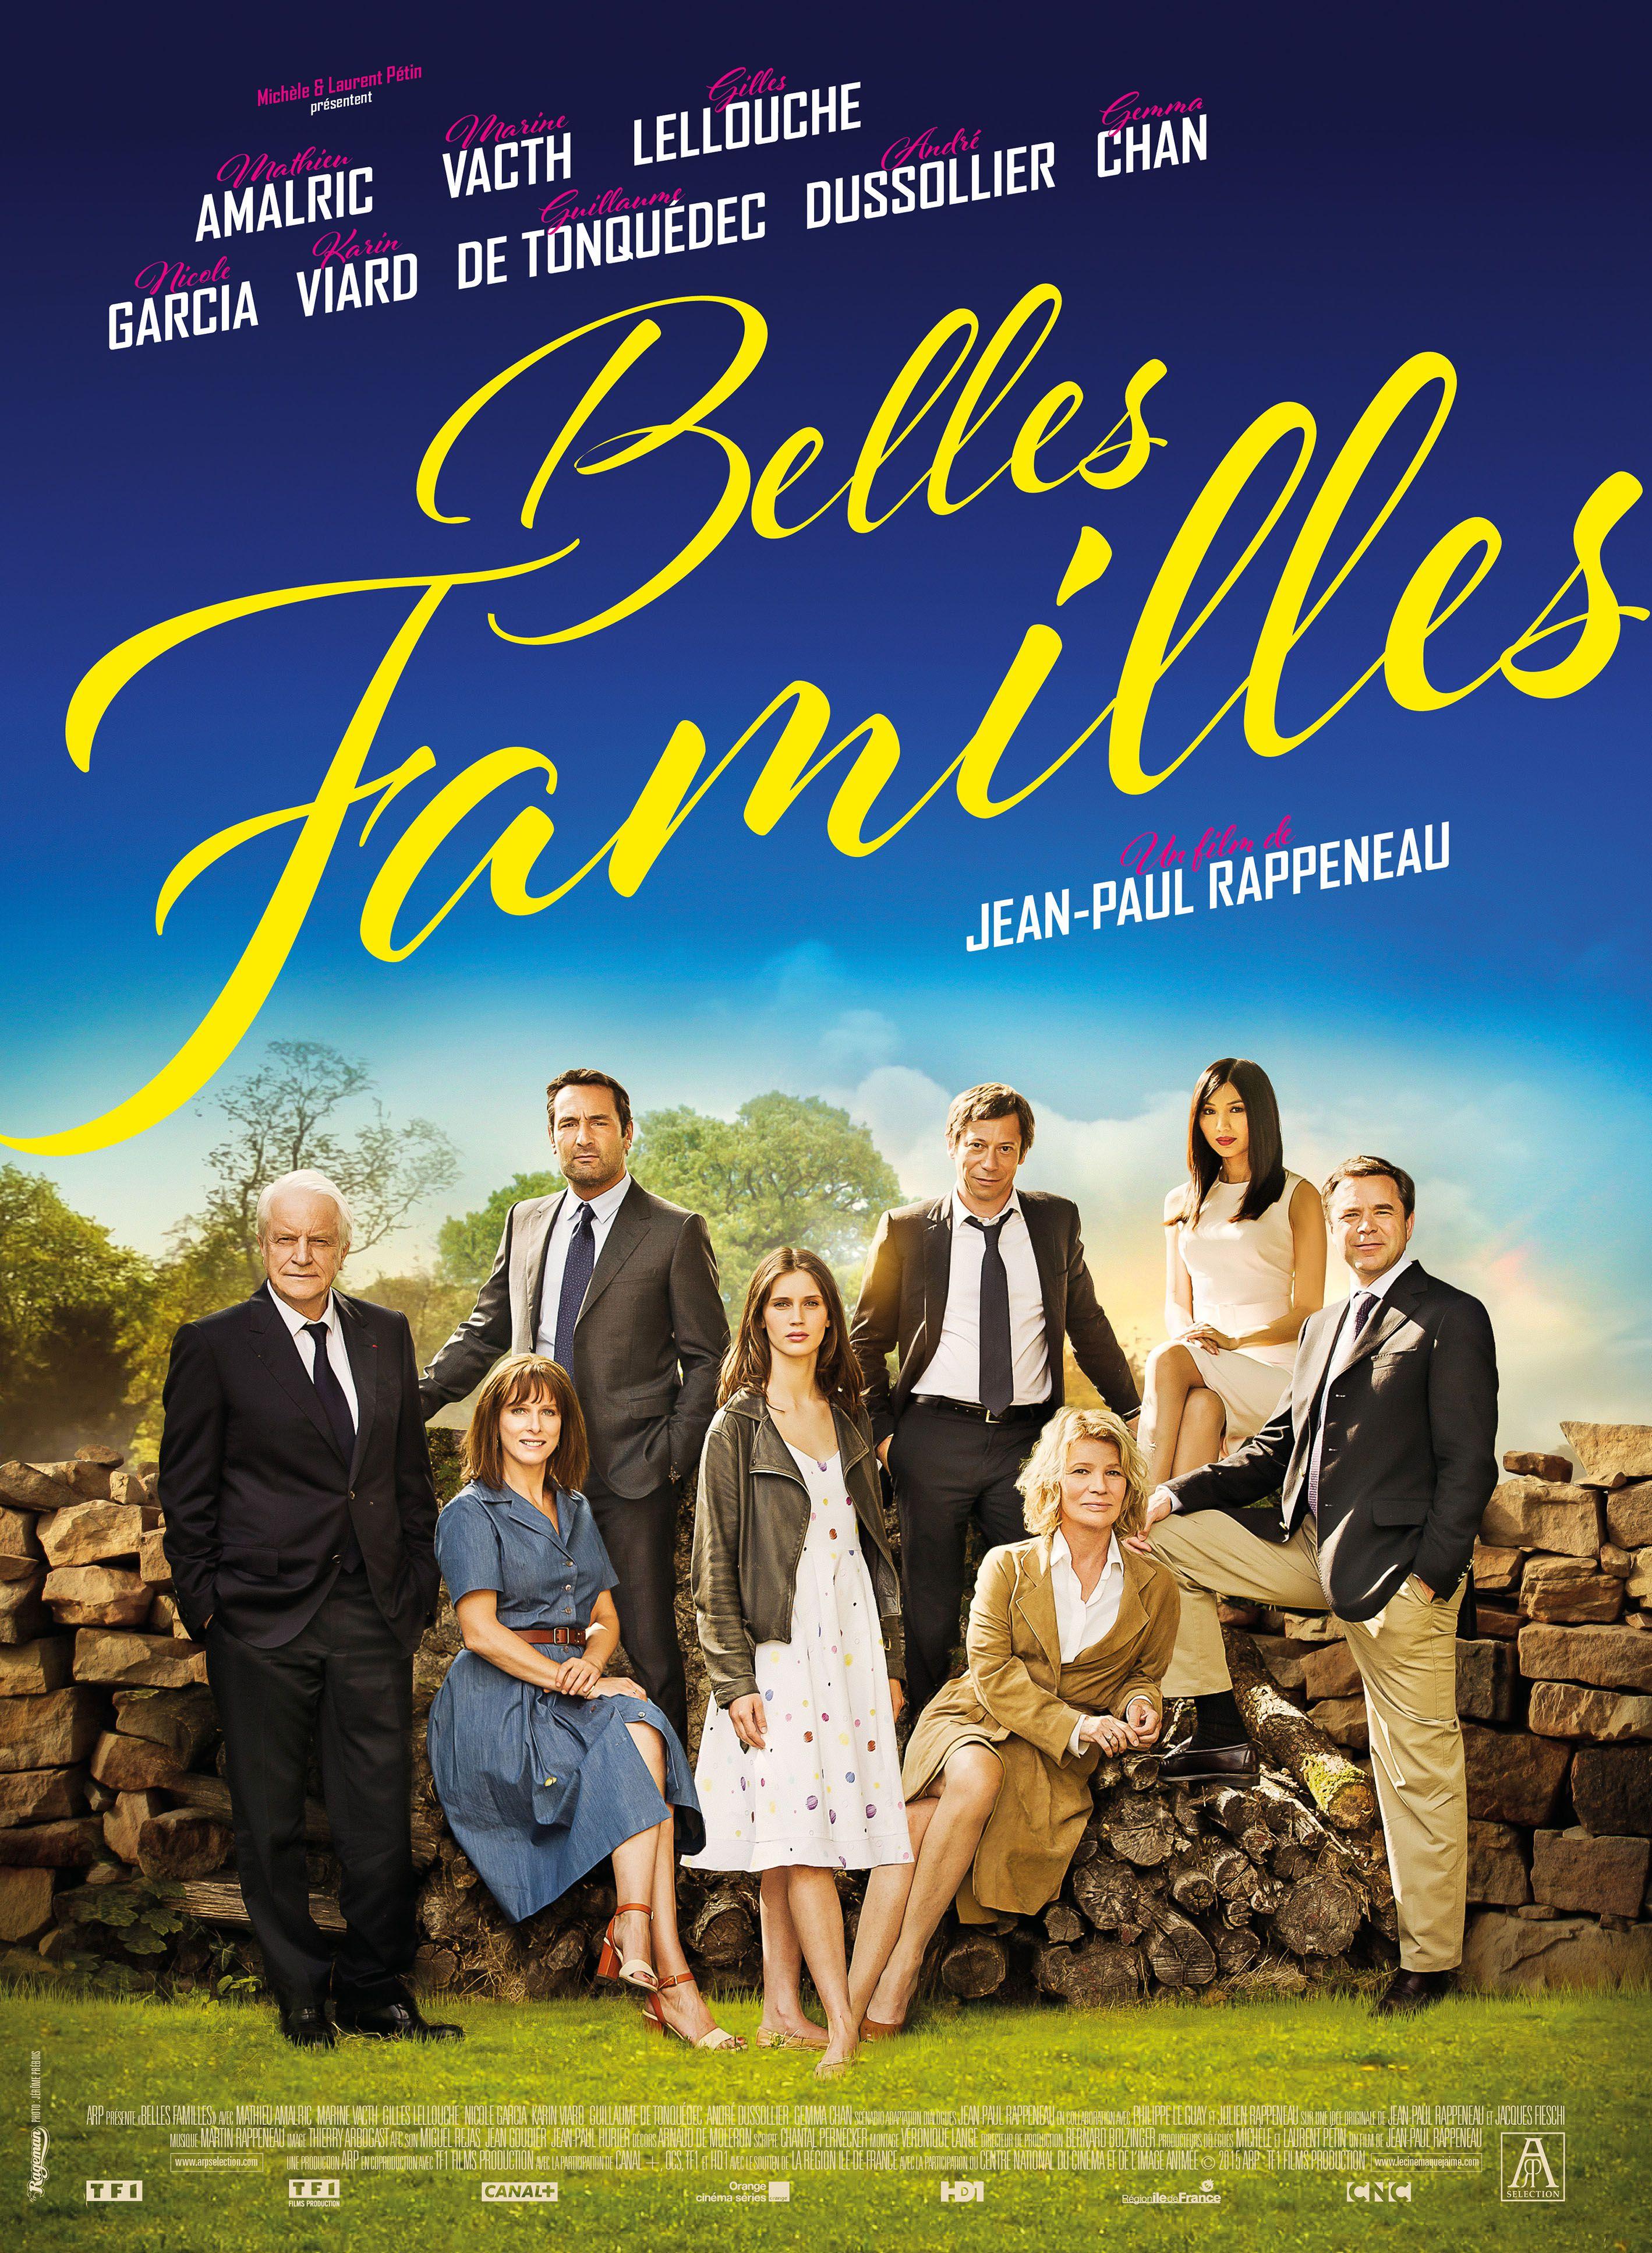 Belles familles - Film (2015)